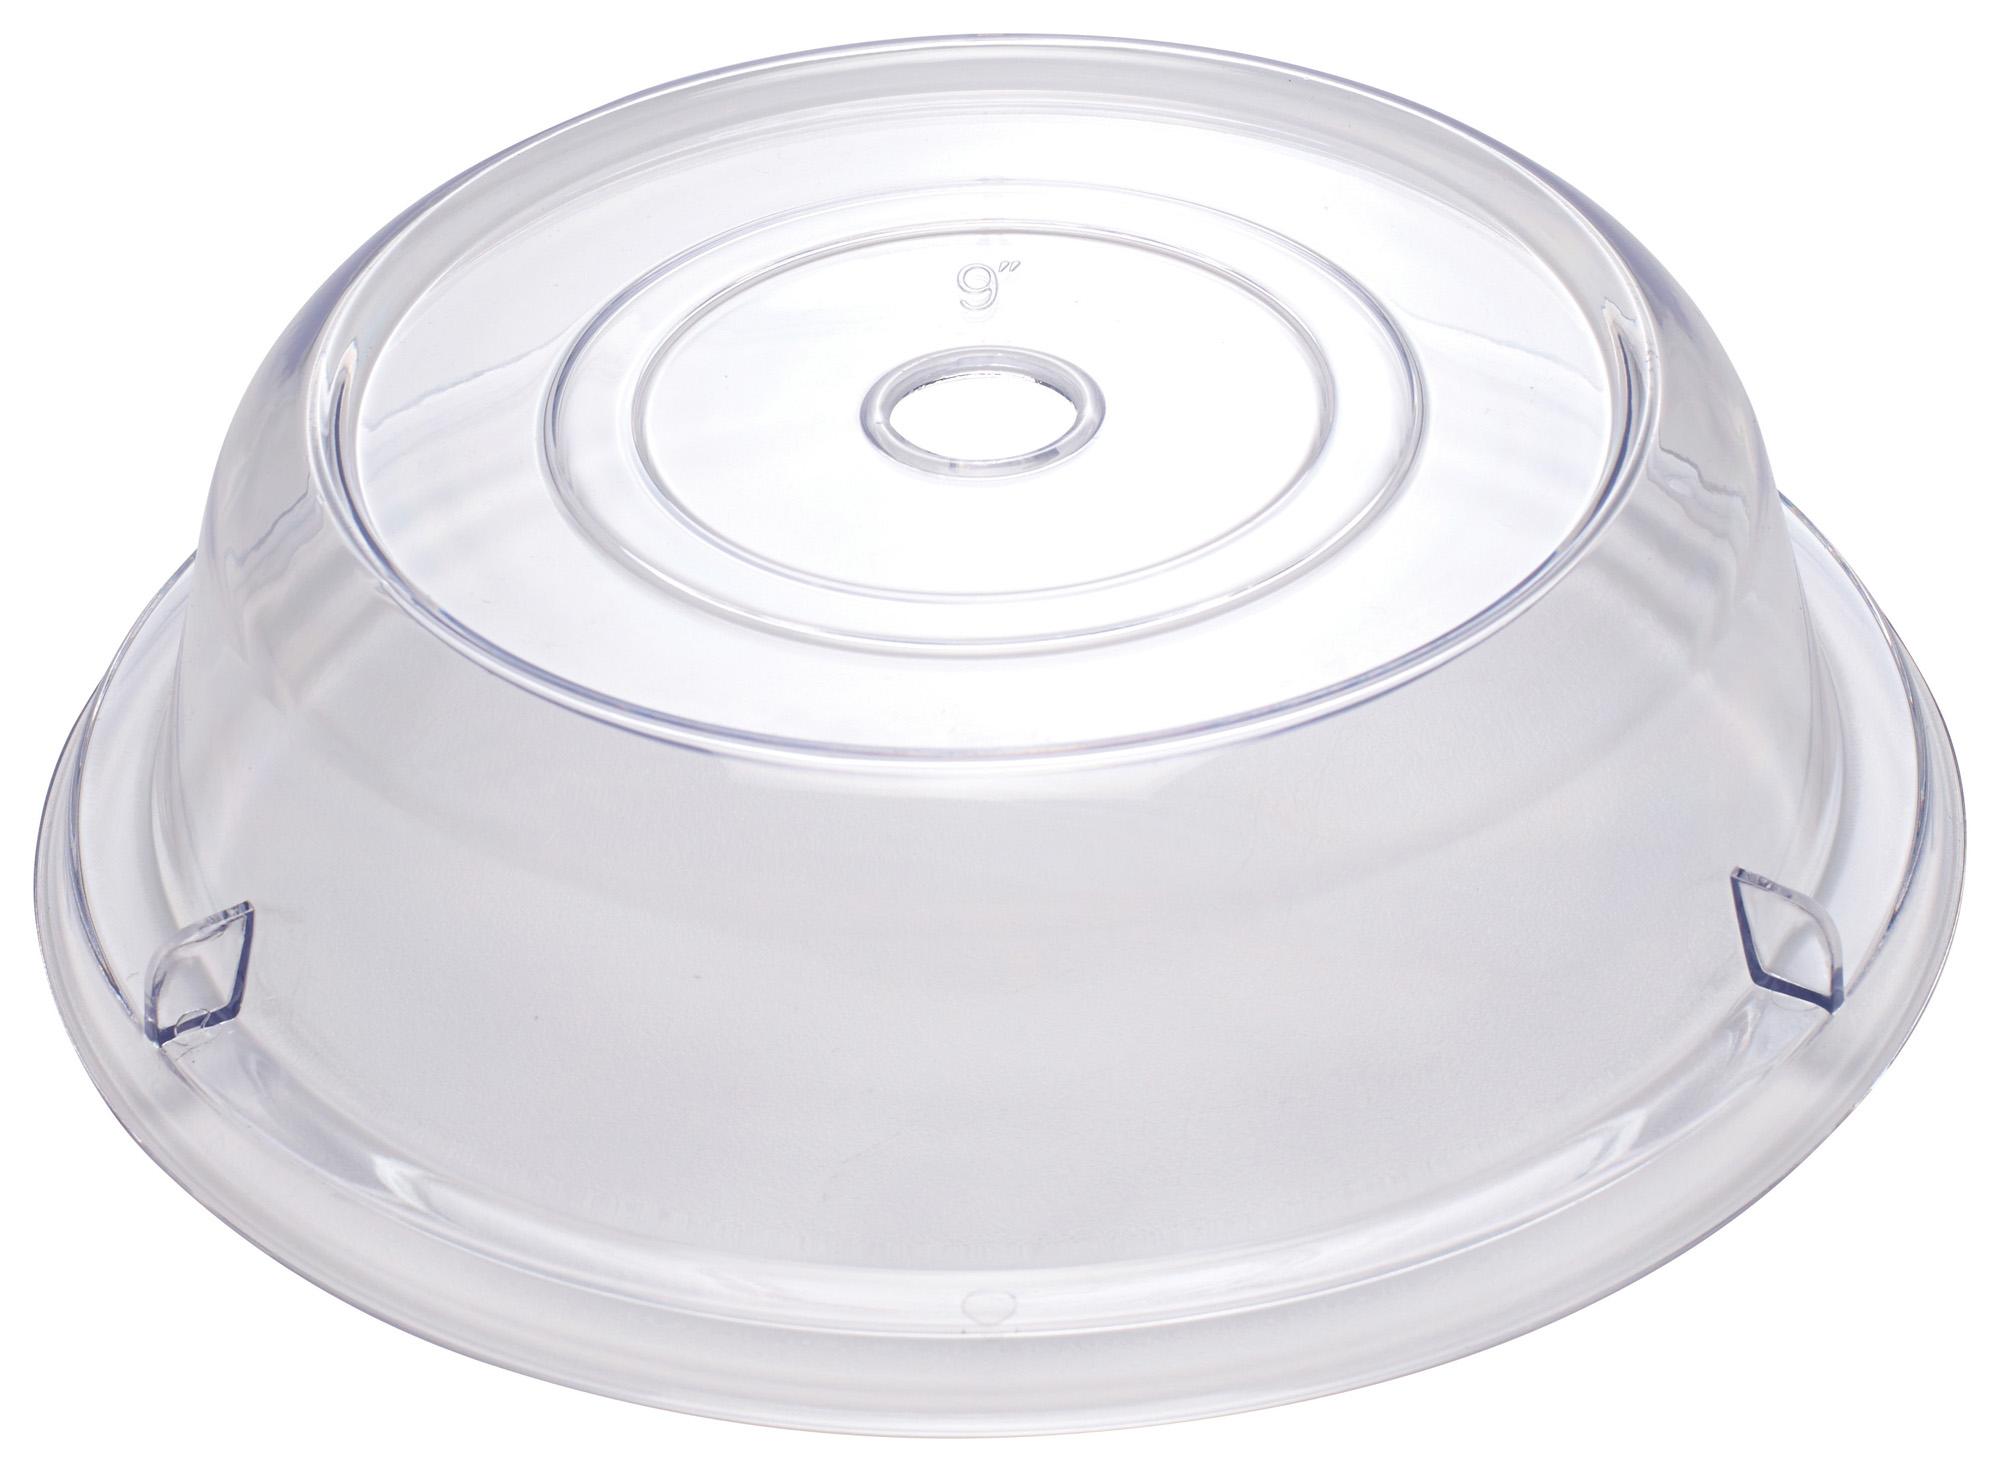 Winco PPCR-9 round plate cover